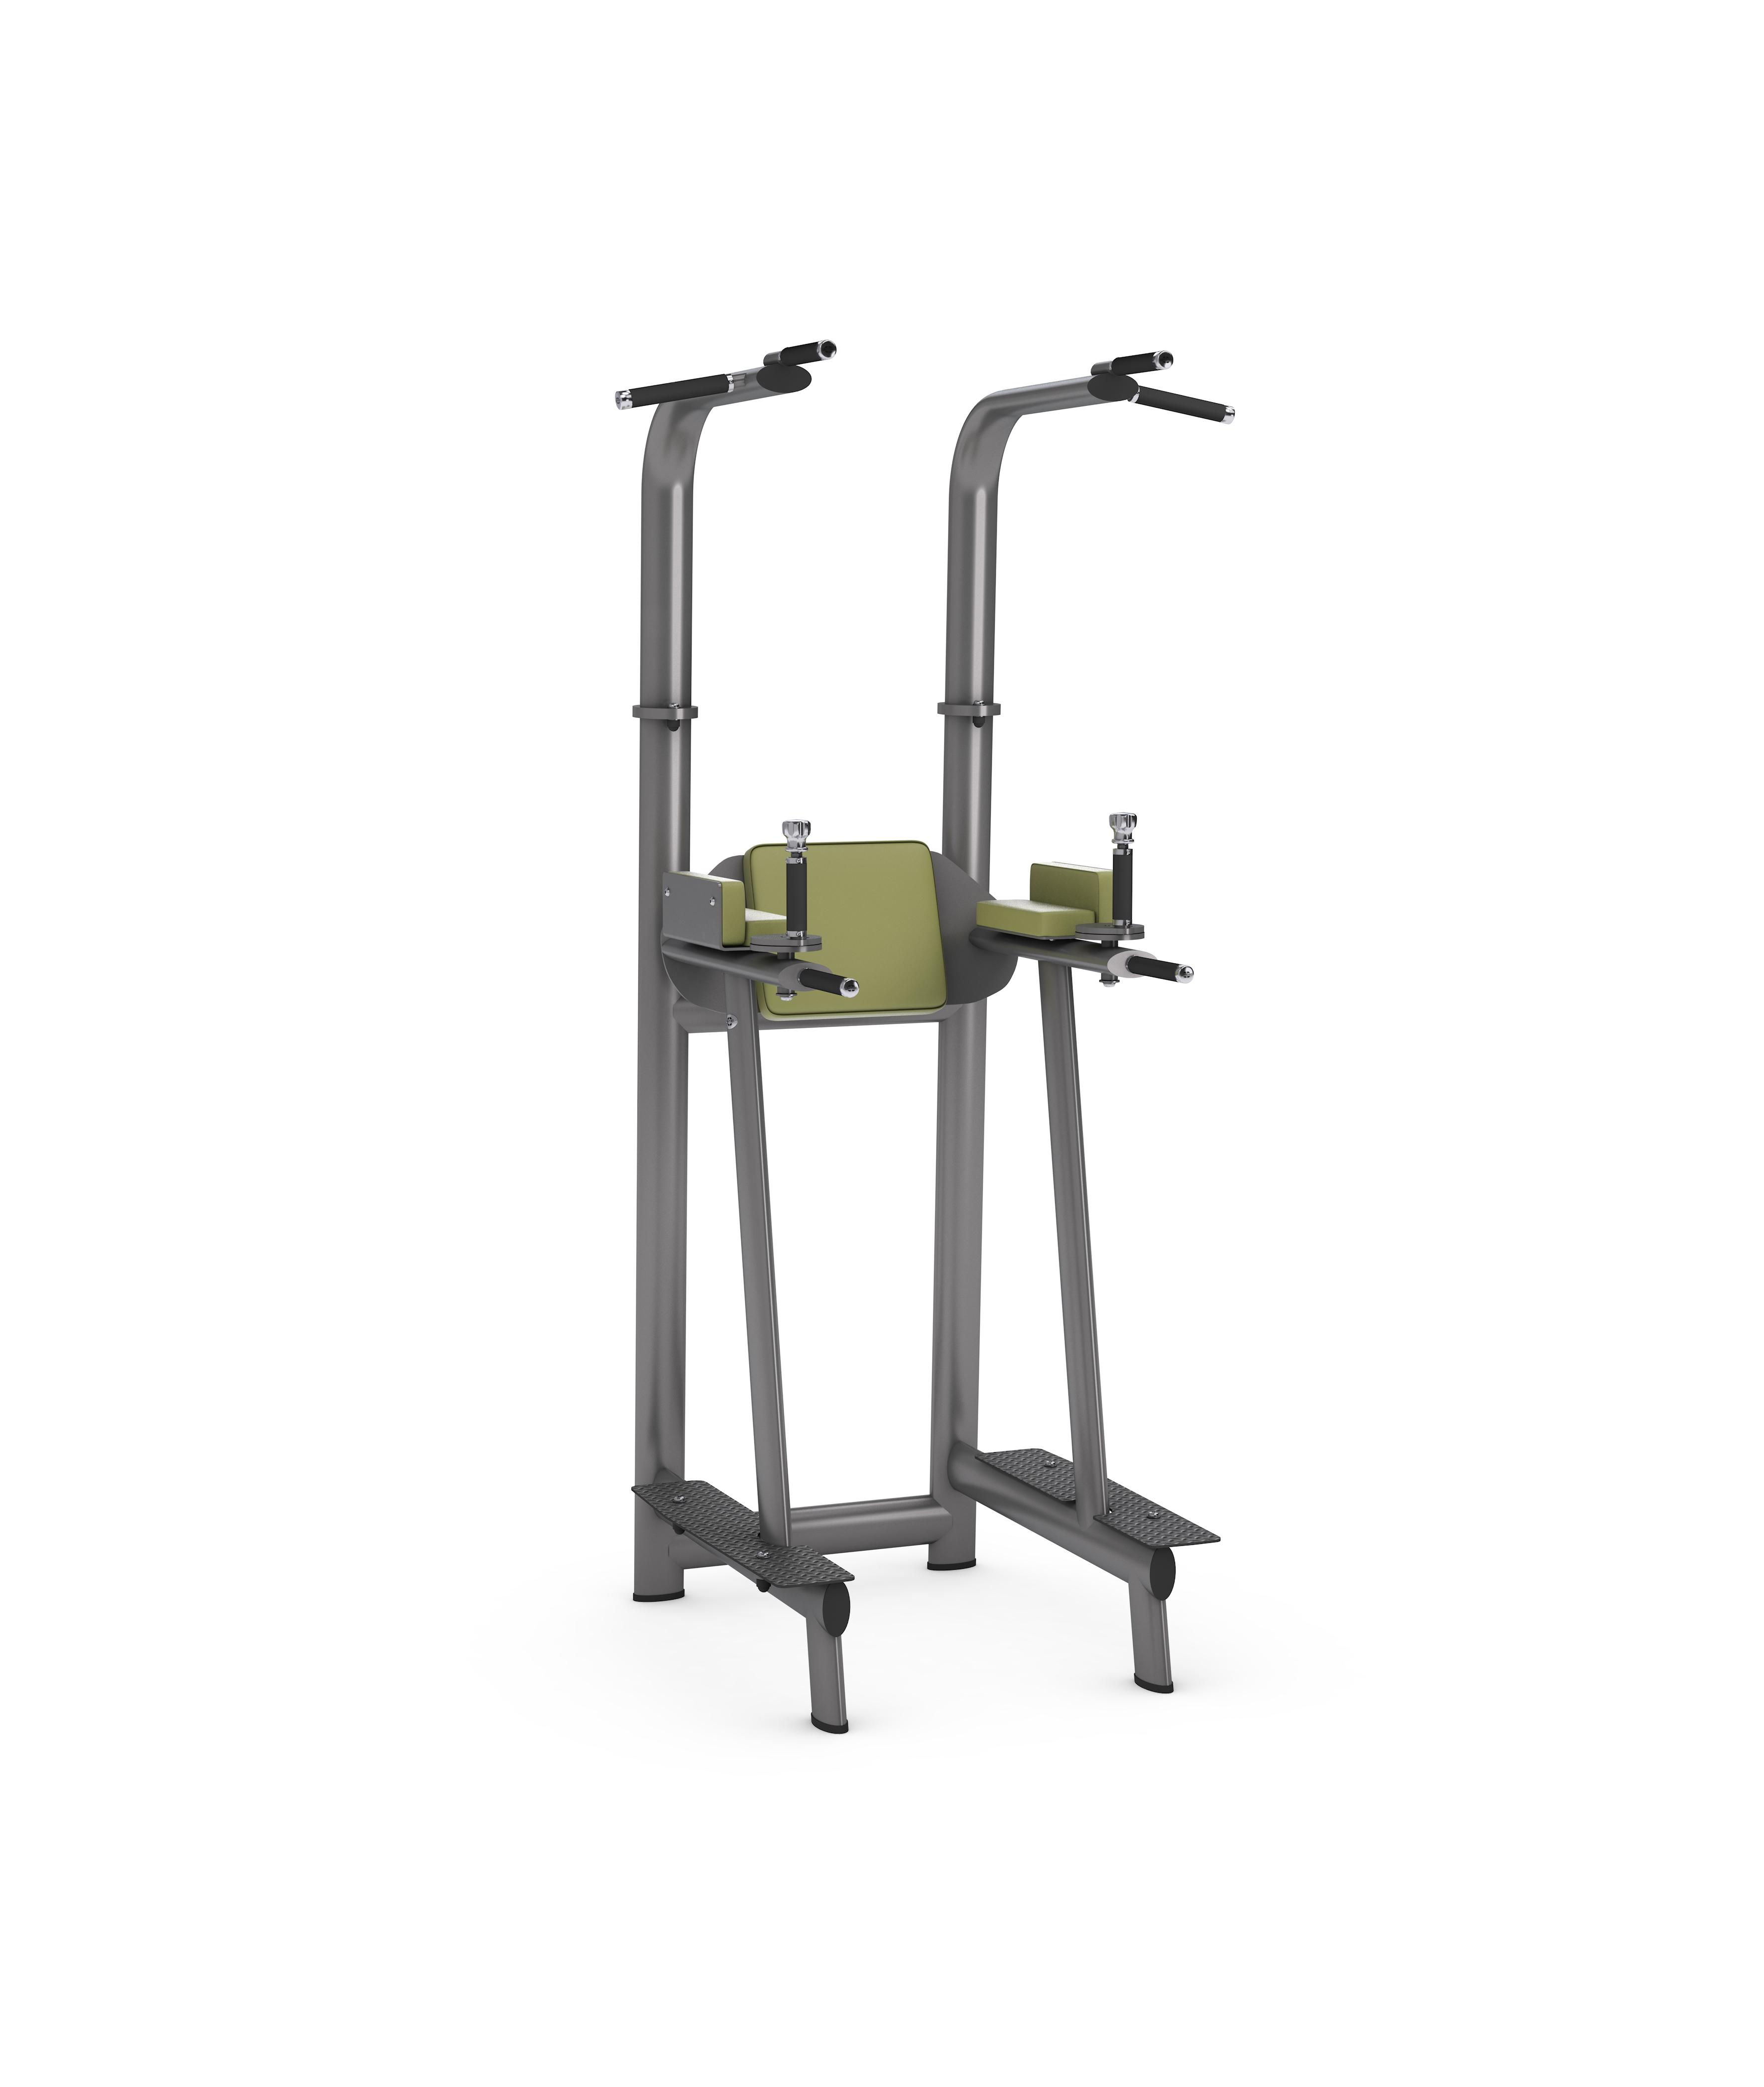 gym80 Basic Pull-Up/Dip/Leg Raise